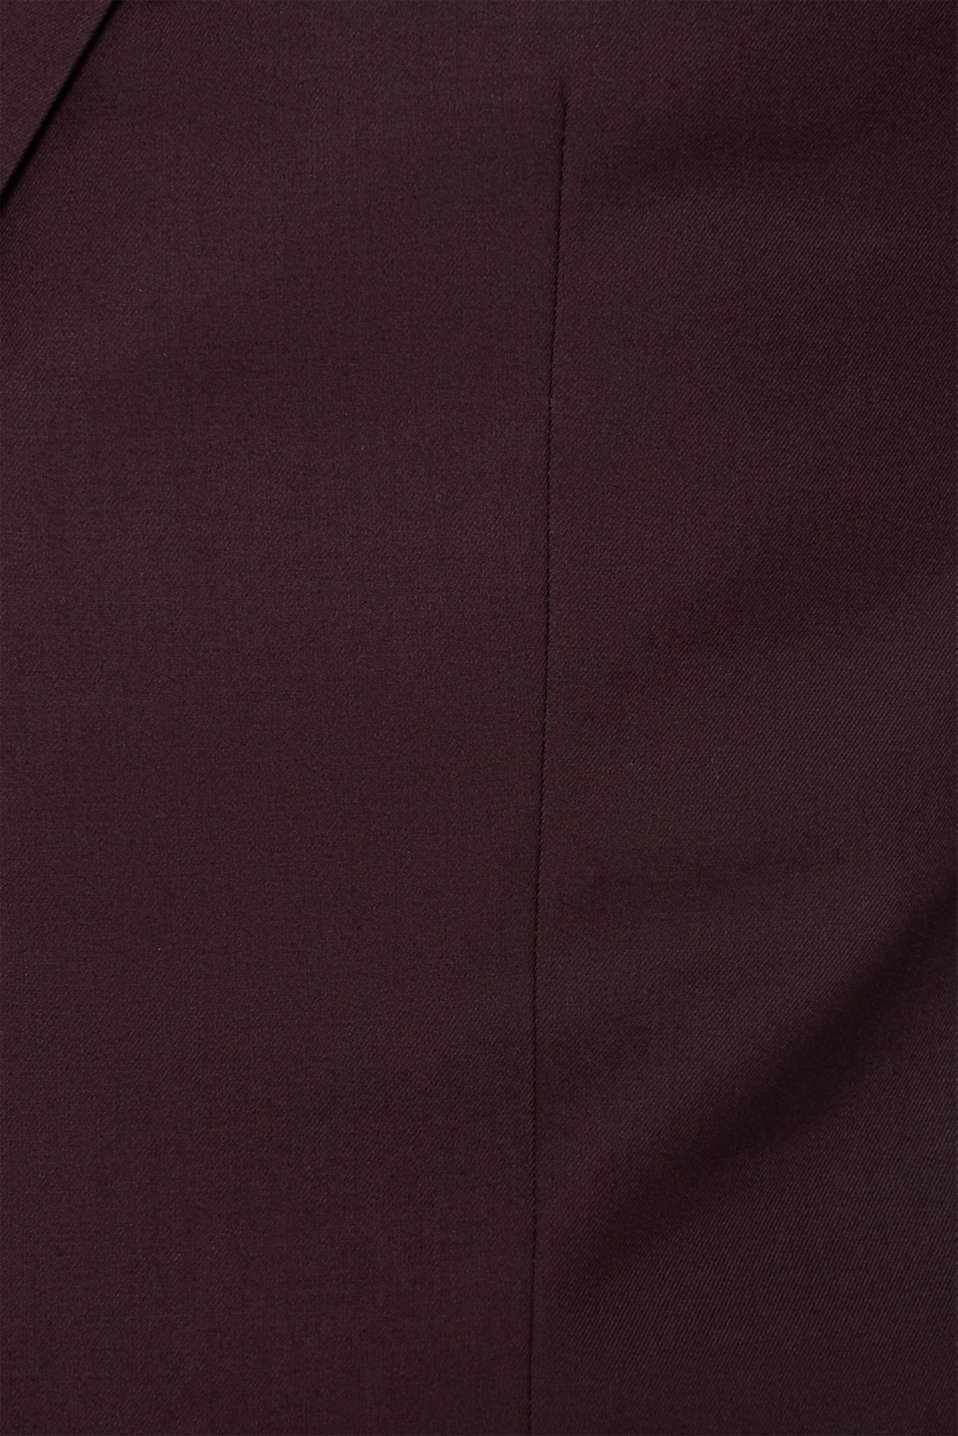 Blazers suit, BORDEAUX RED, detail image number 4